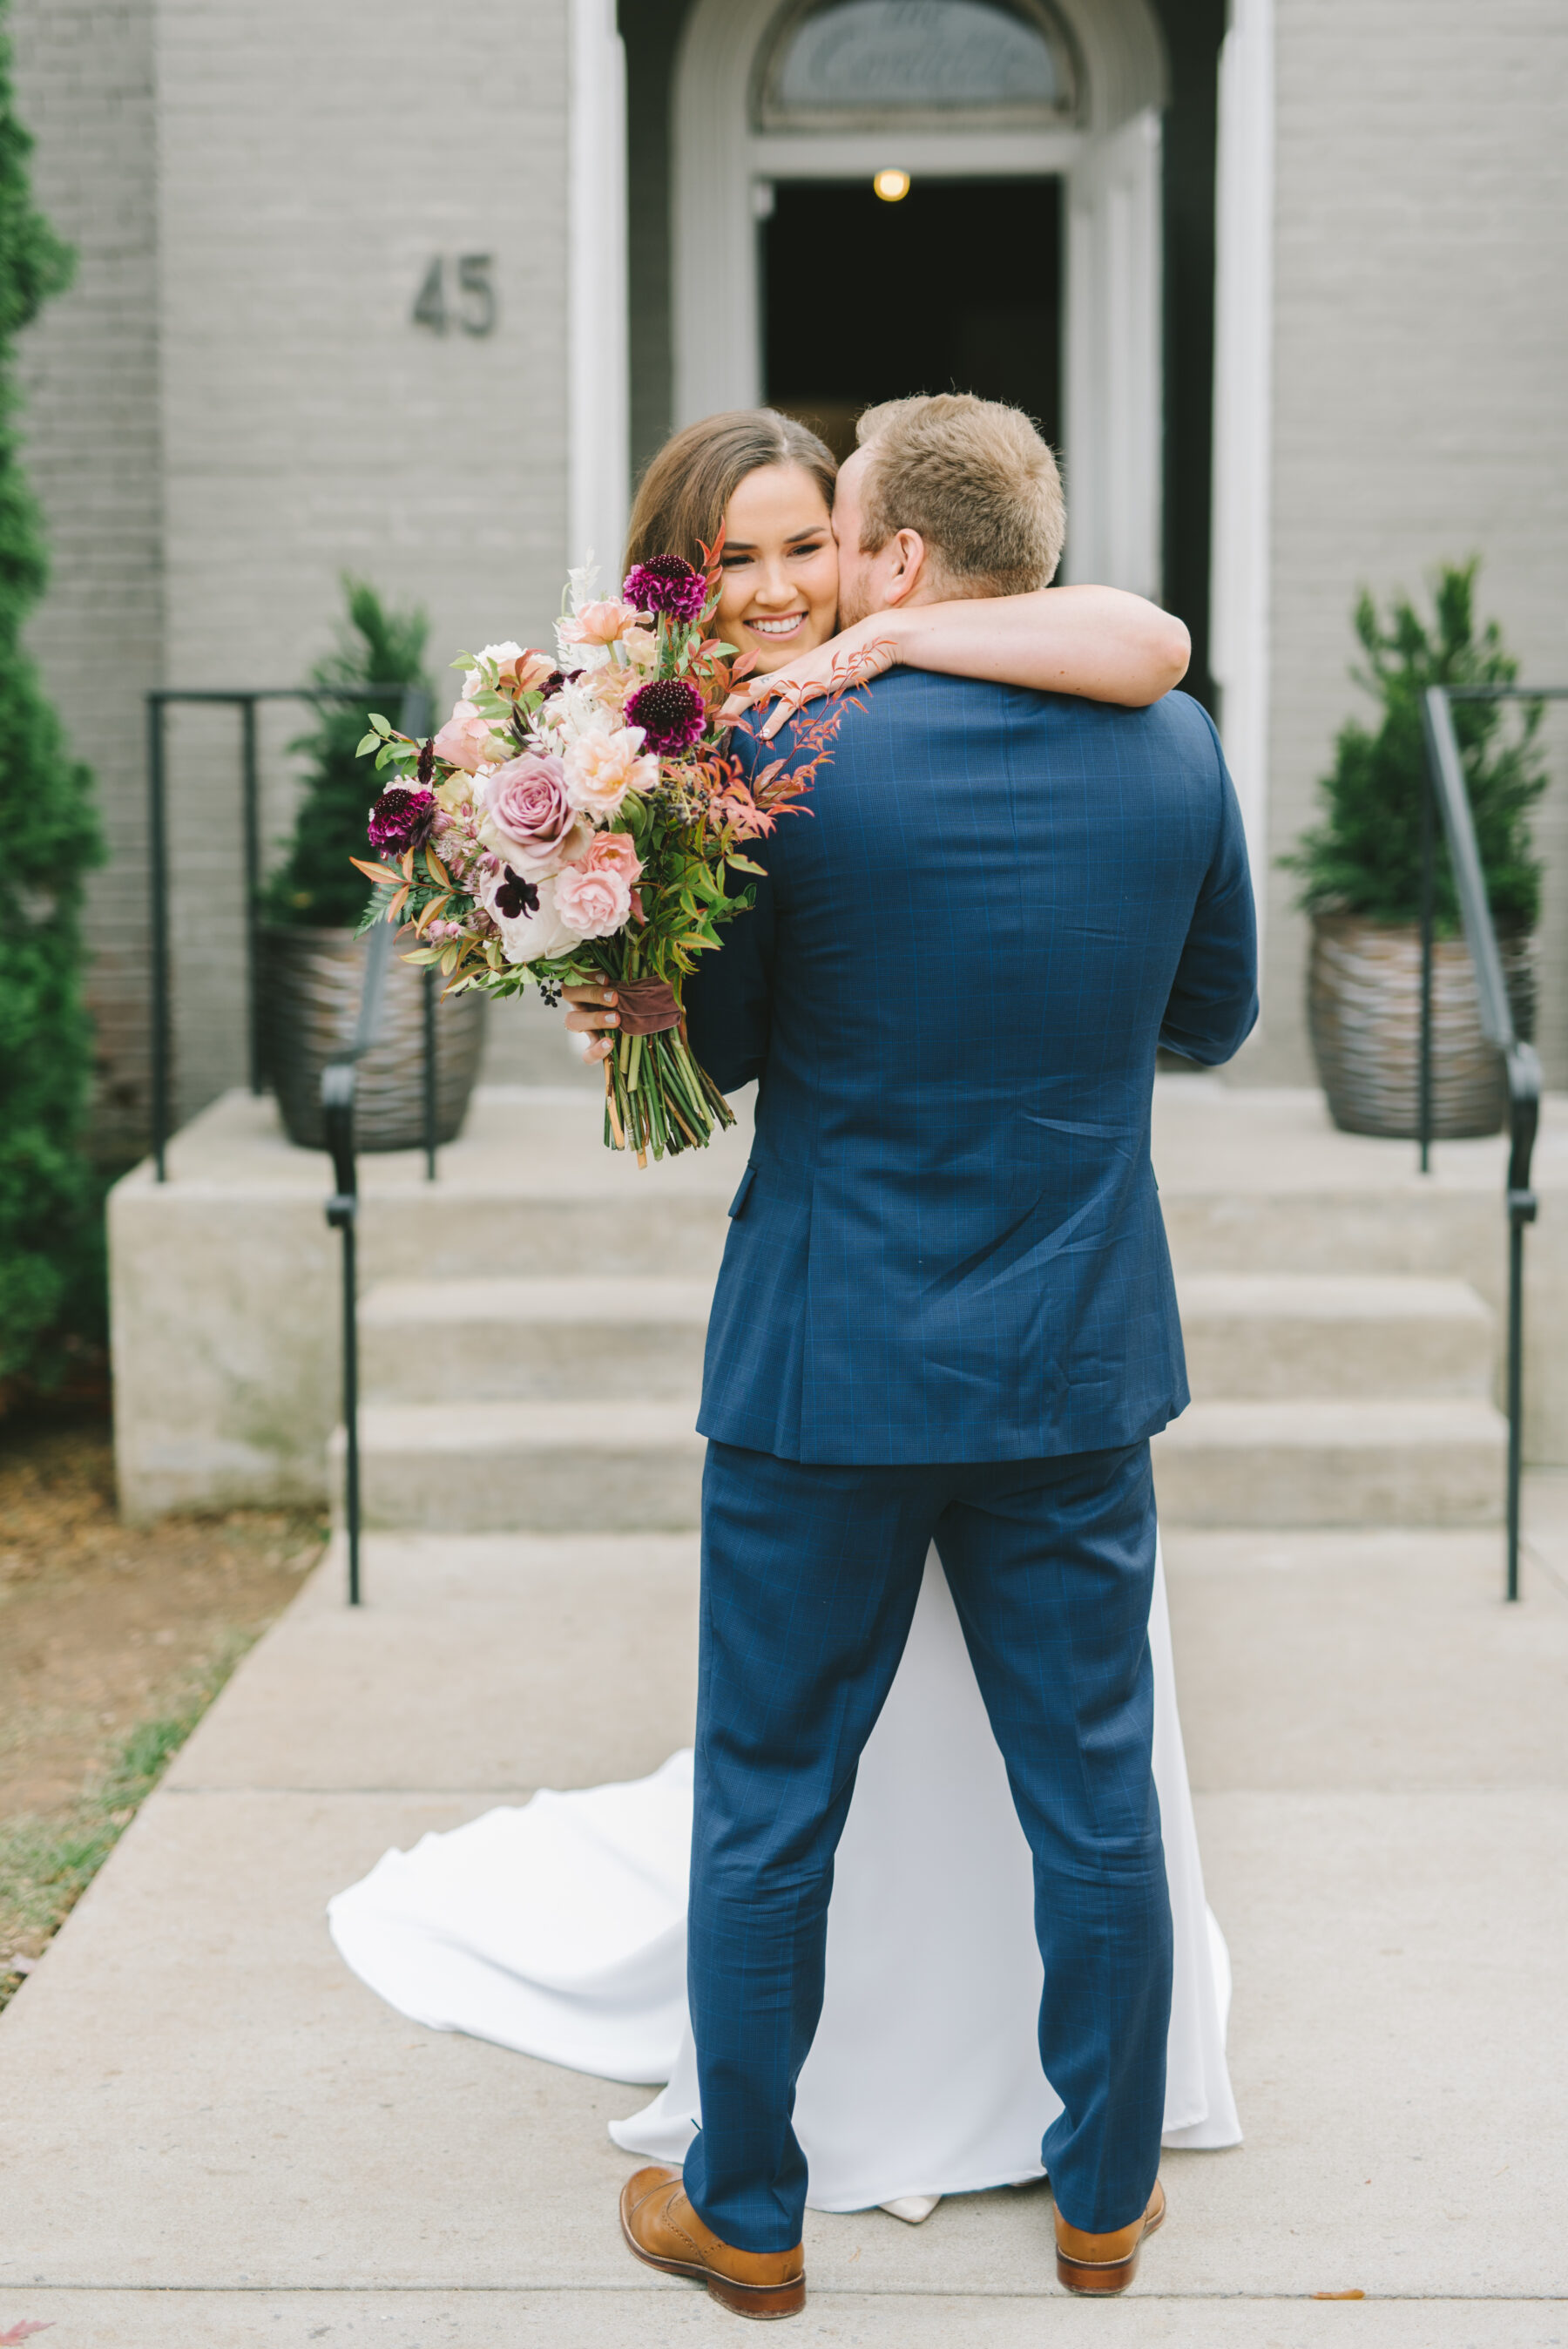 Nashville Wedding Photographer Kera Photography   Nashville Bride Guide